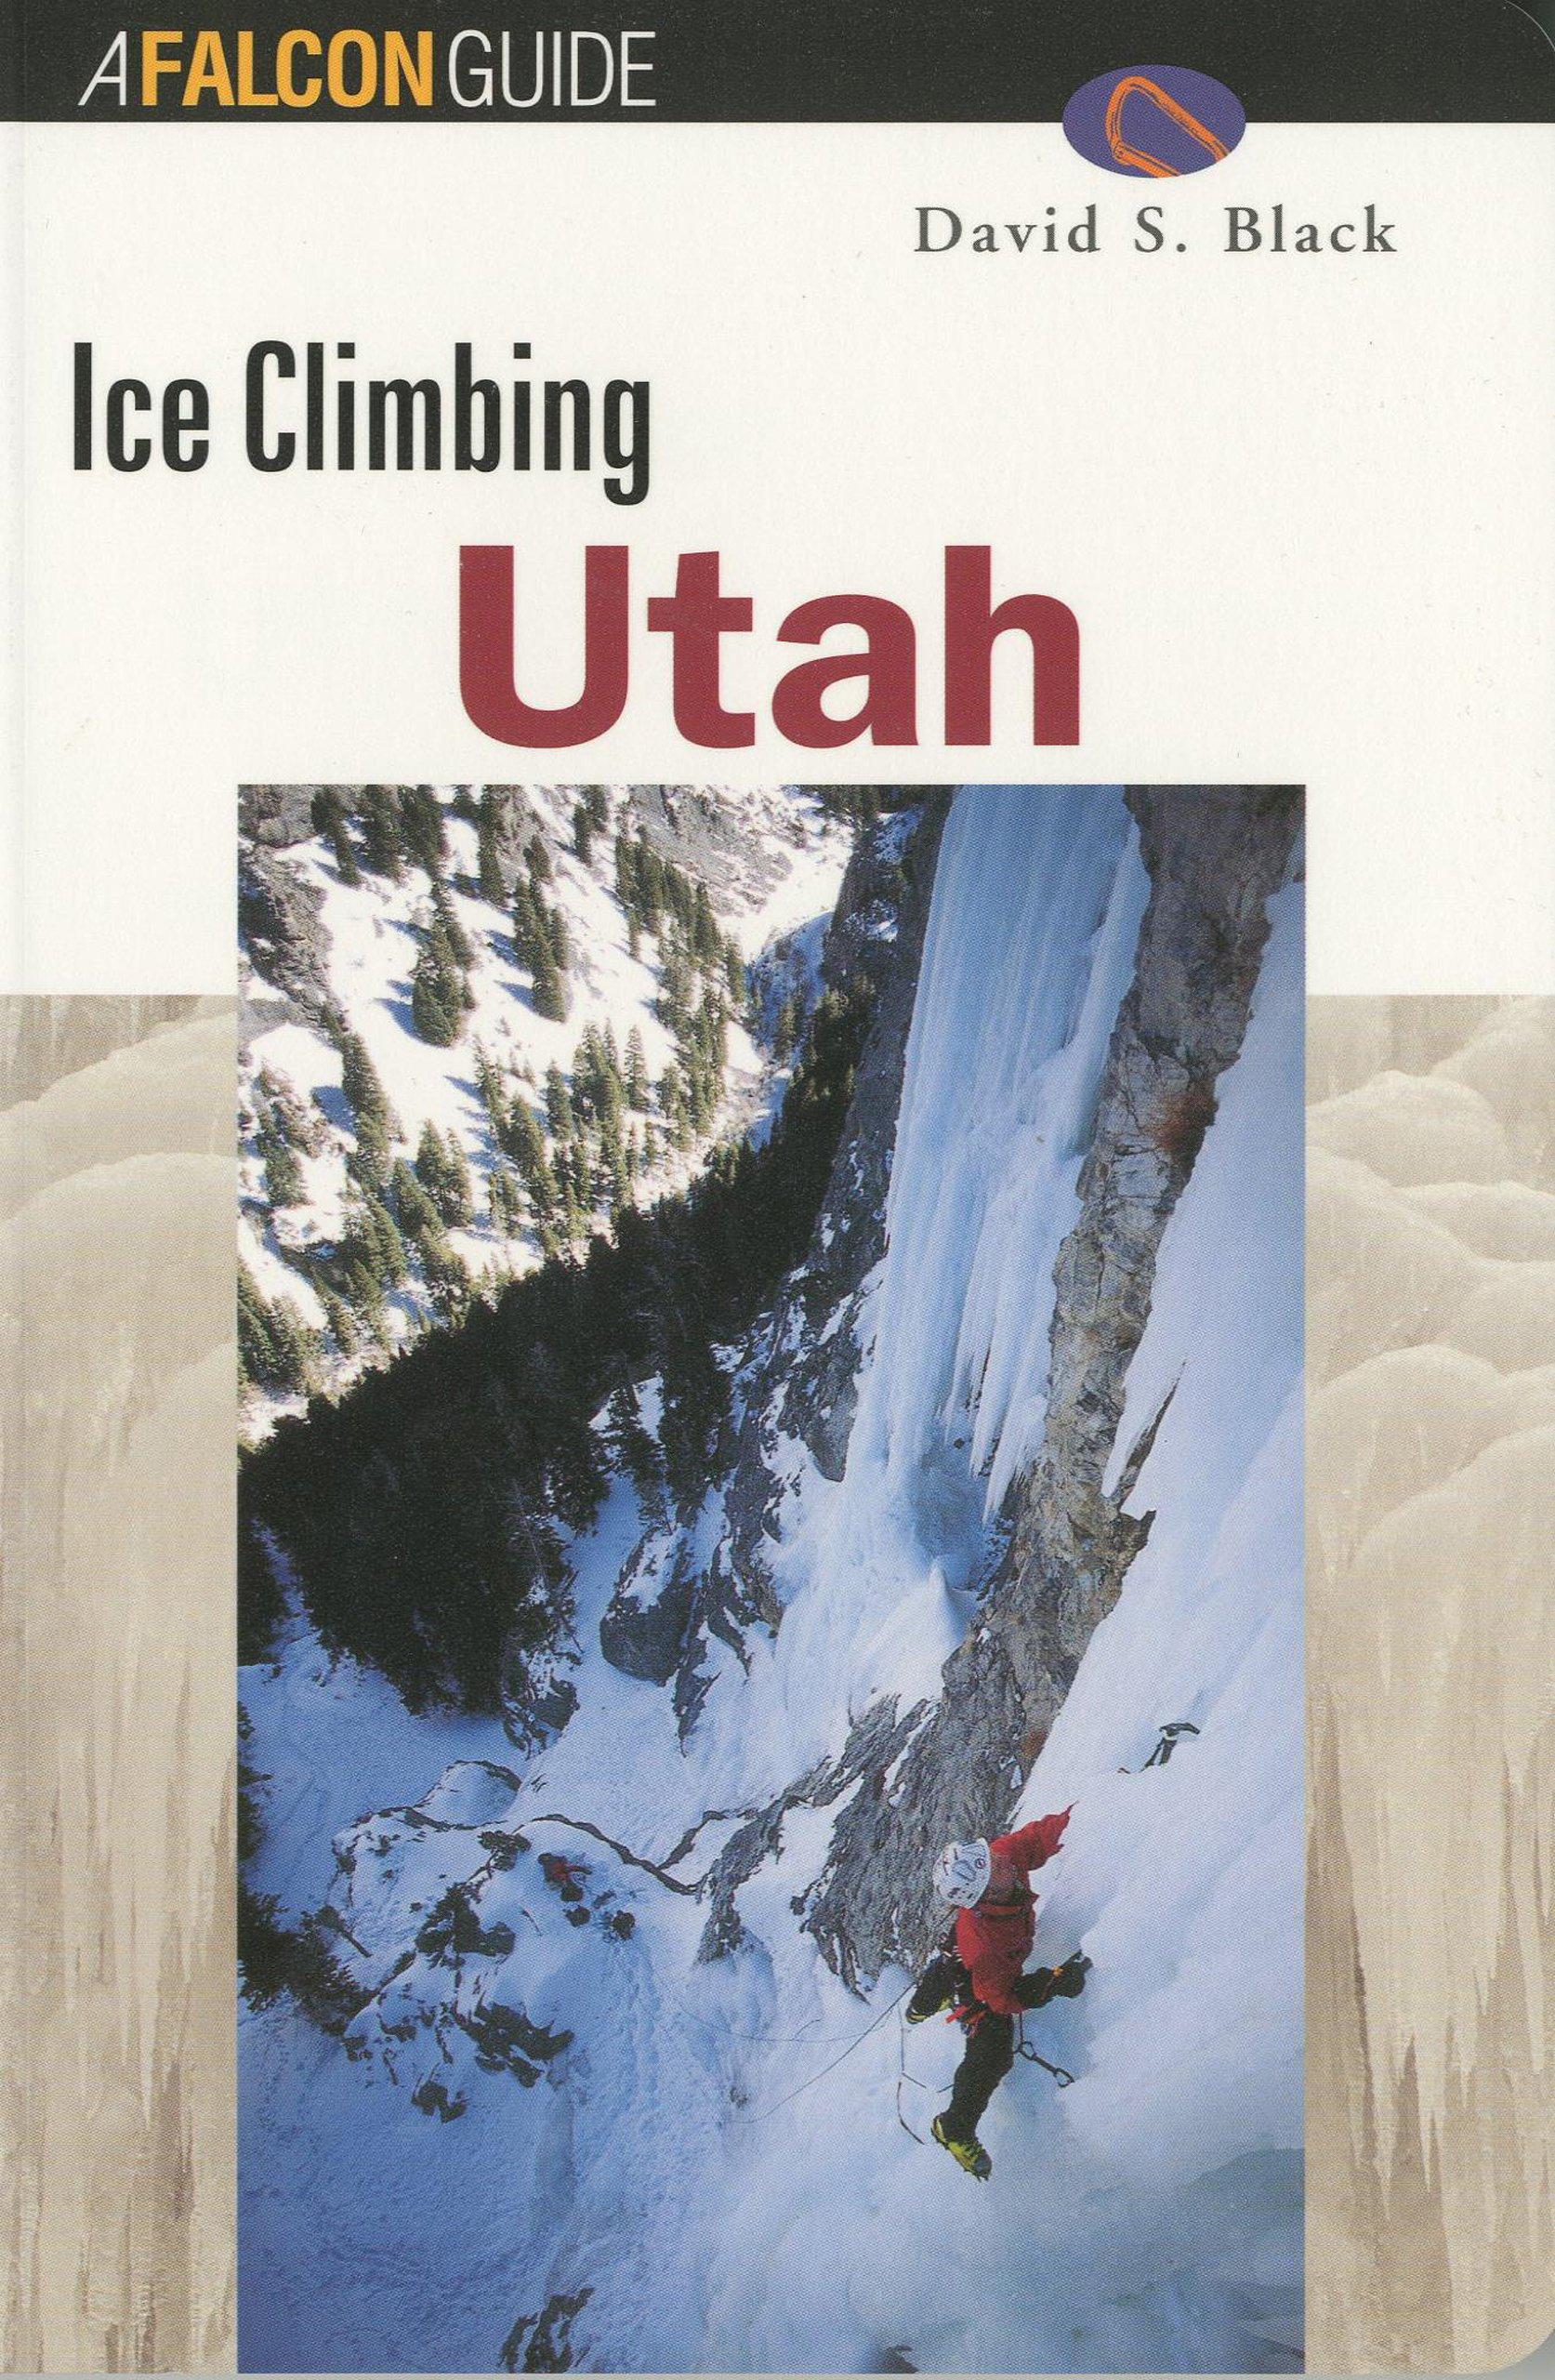 Ice Climbing Utah Regional Rock product image